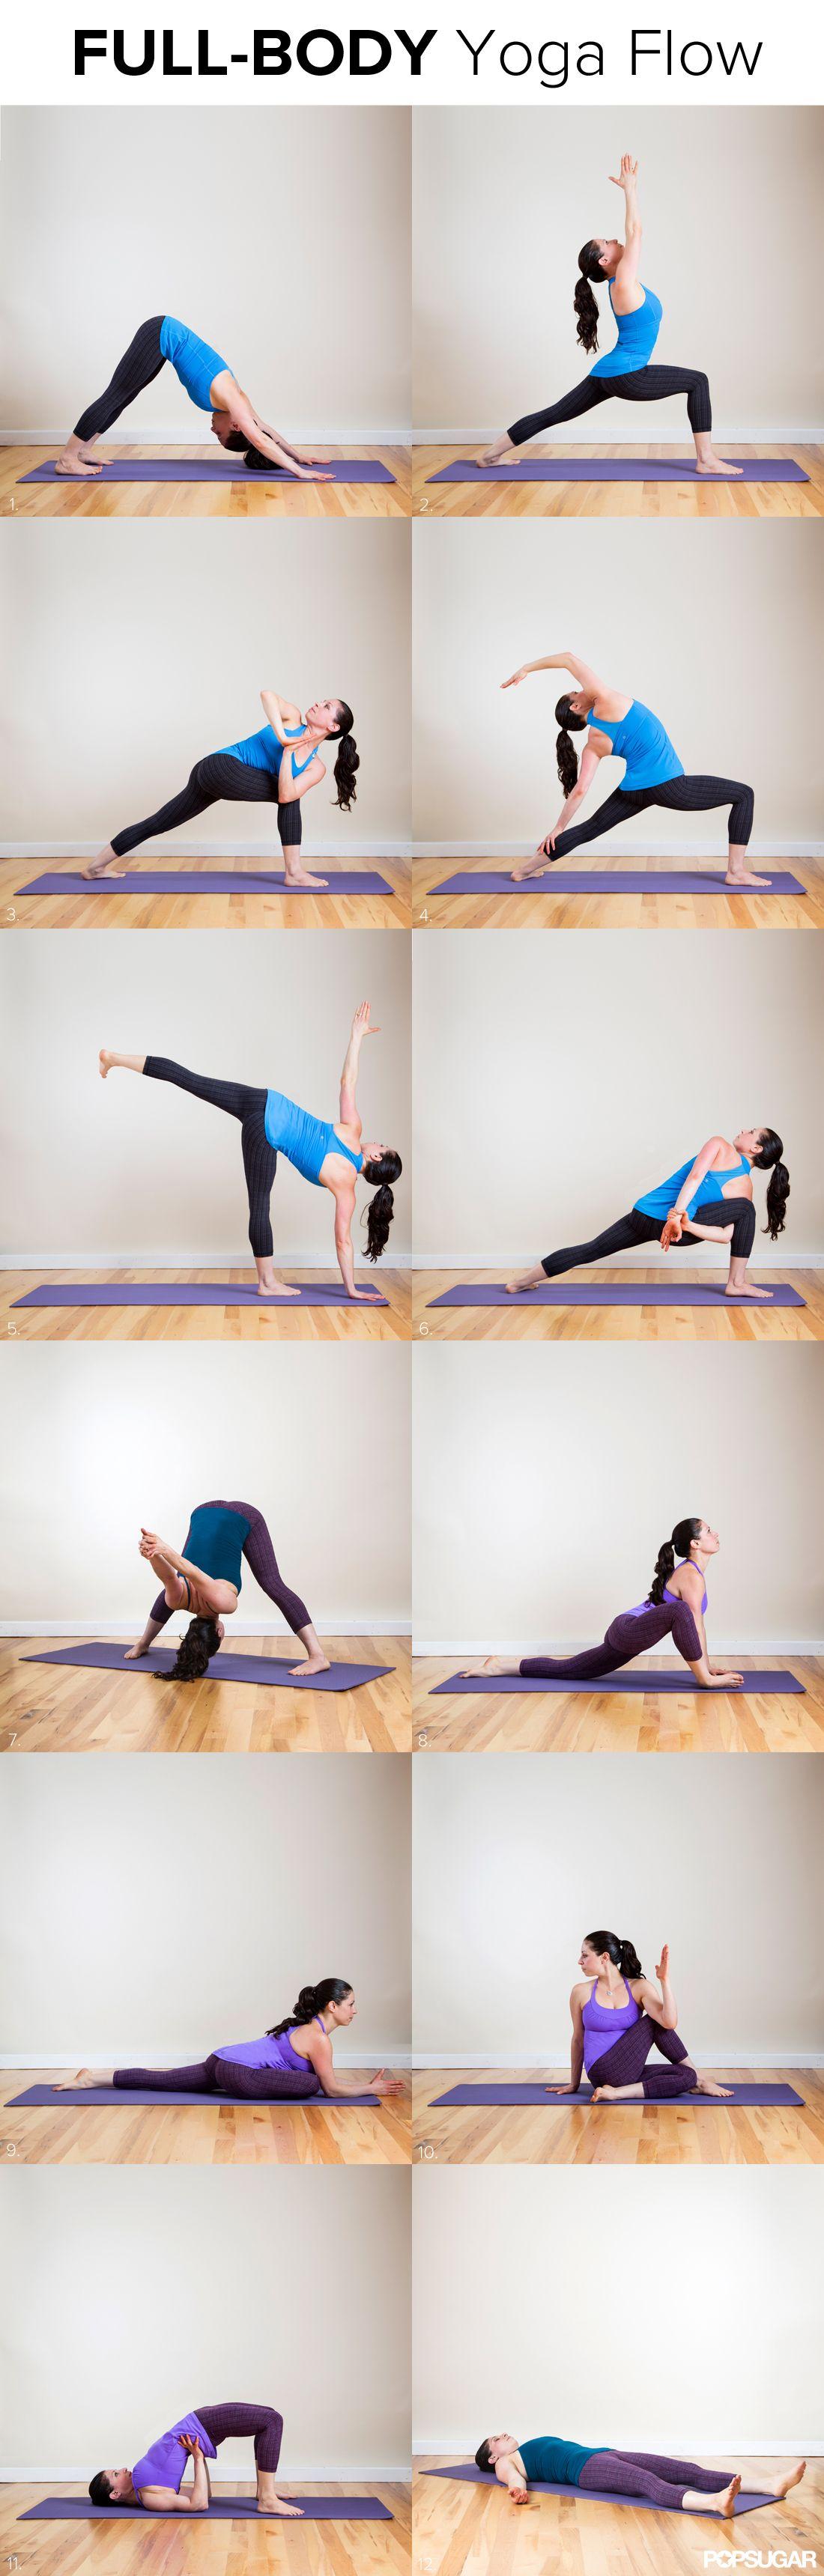 Long And Lean Full Body Yoga Flow Vinyasa PosesBasic